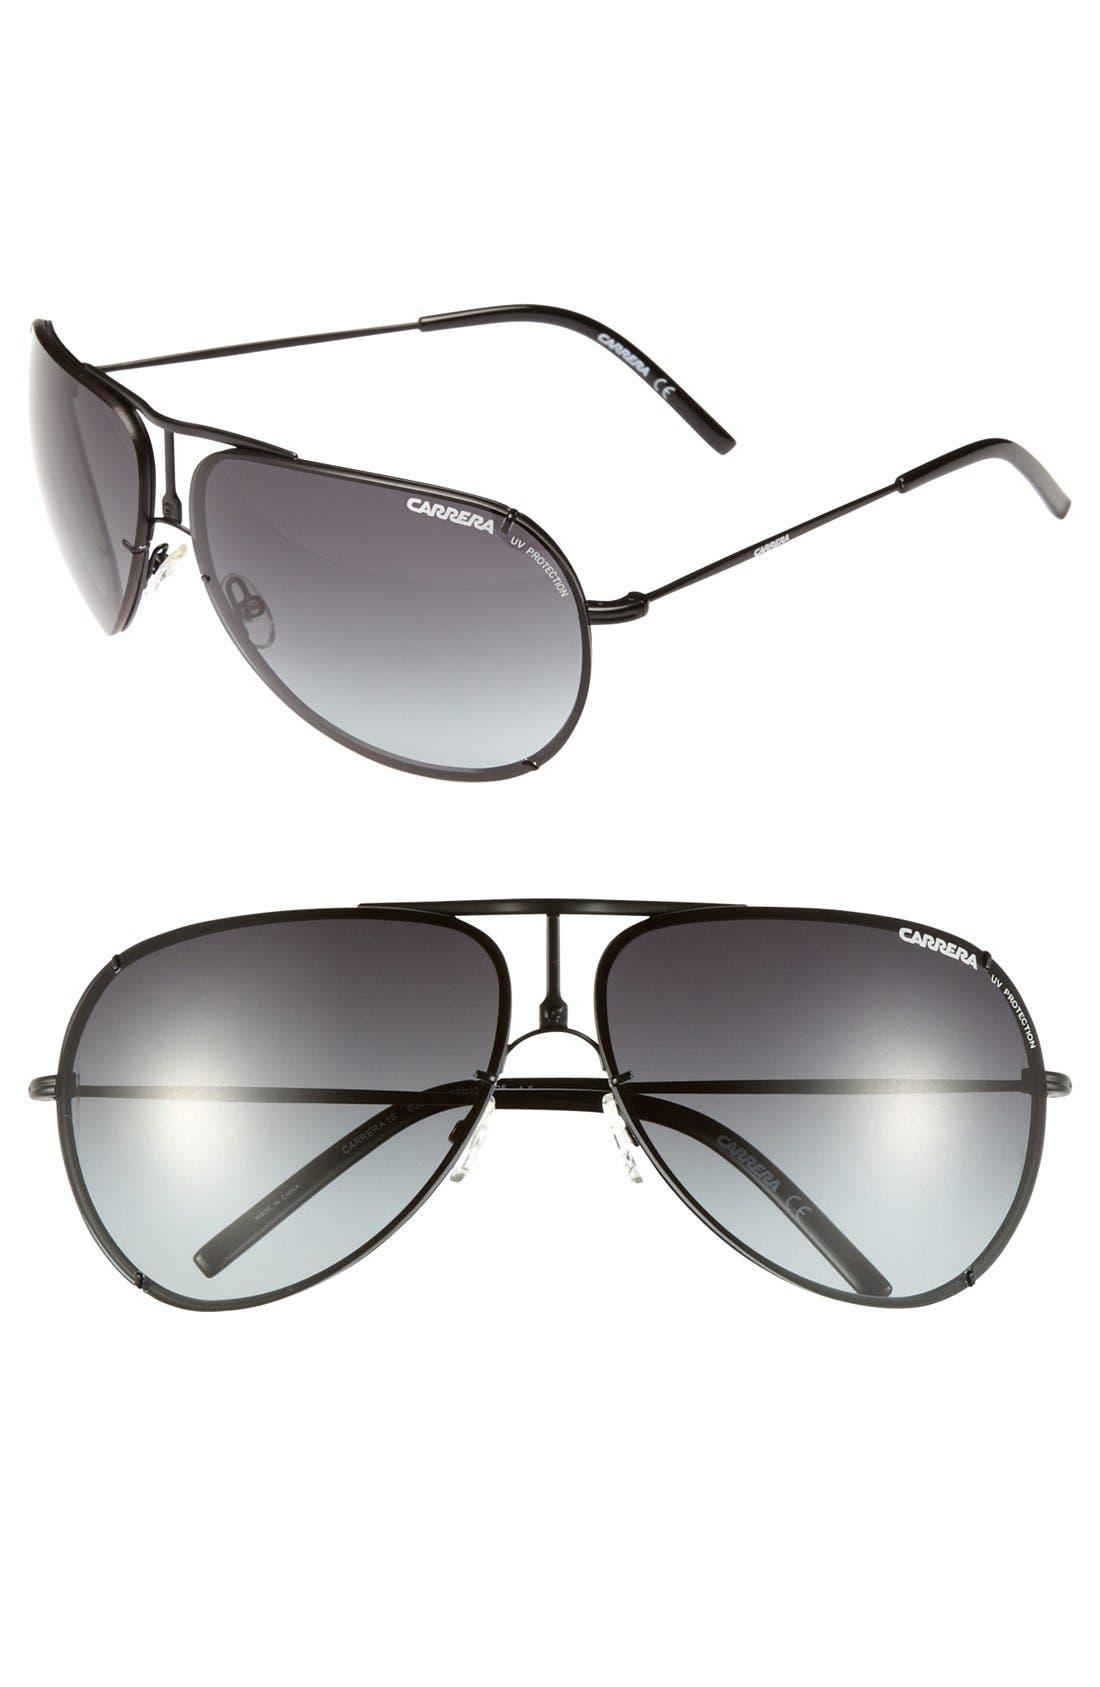 Alternate Image 1 Selected - Carrera Eyewear 67mm Metal Aviator Sunglasses